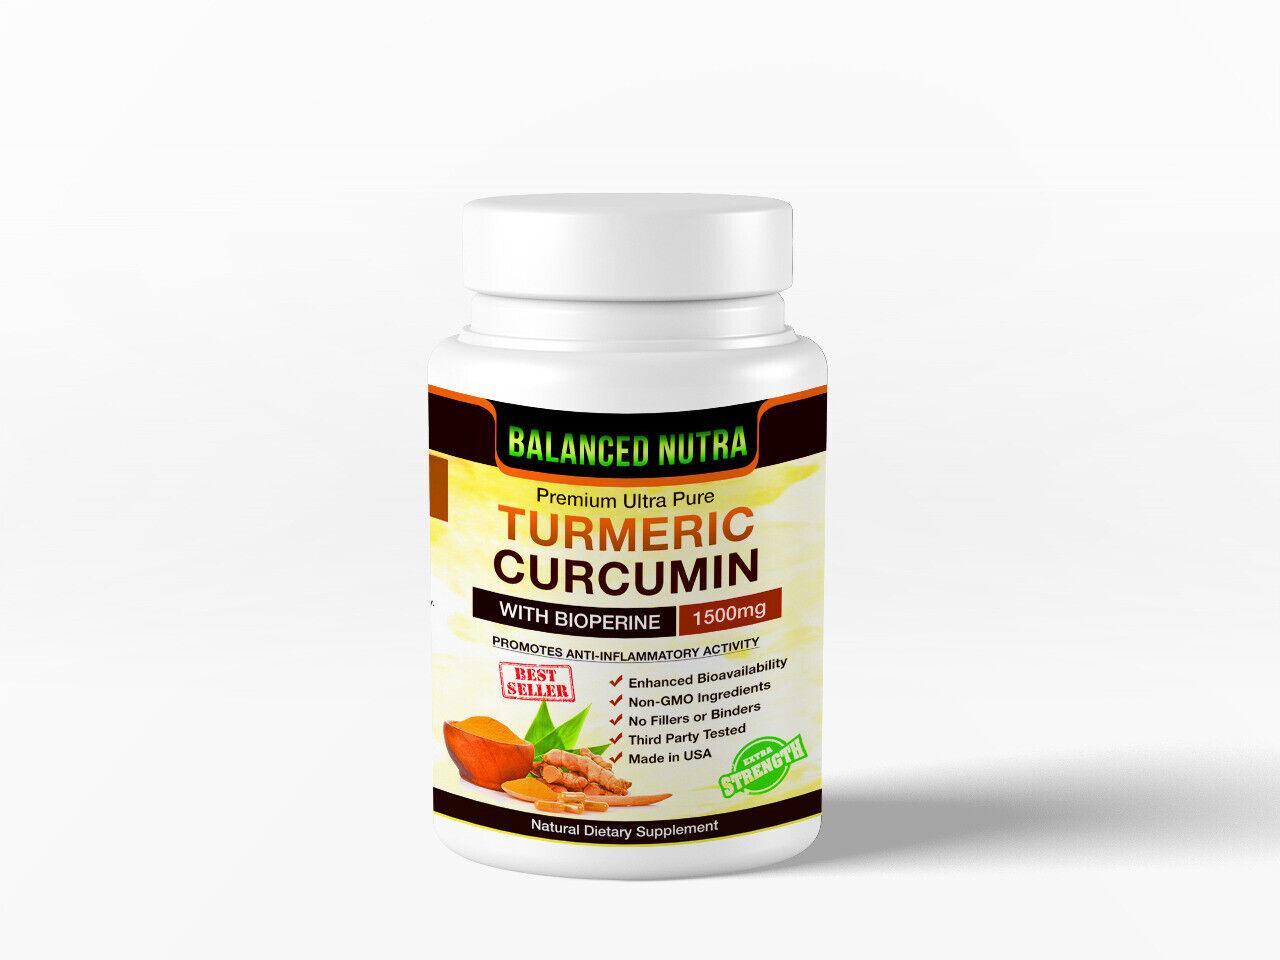 Best Selling Turmeric Curcumin with Bioperine Black Pepper 1500mg Extra Strength 1